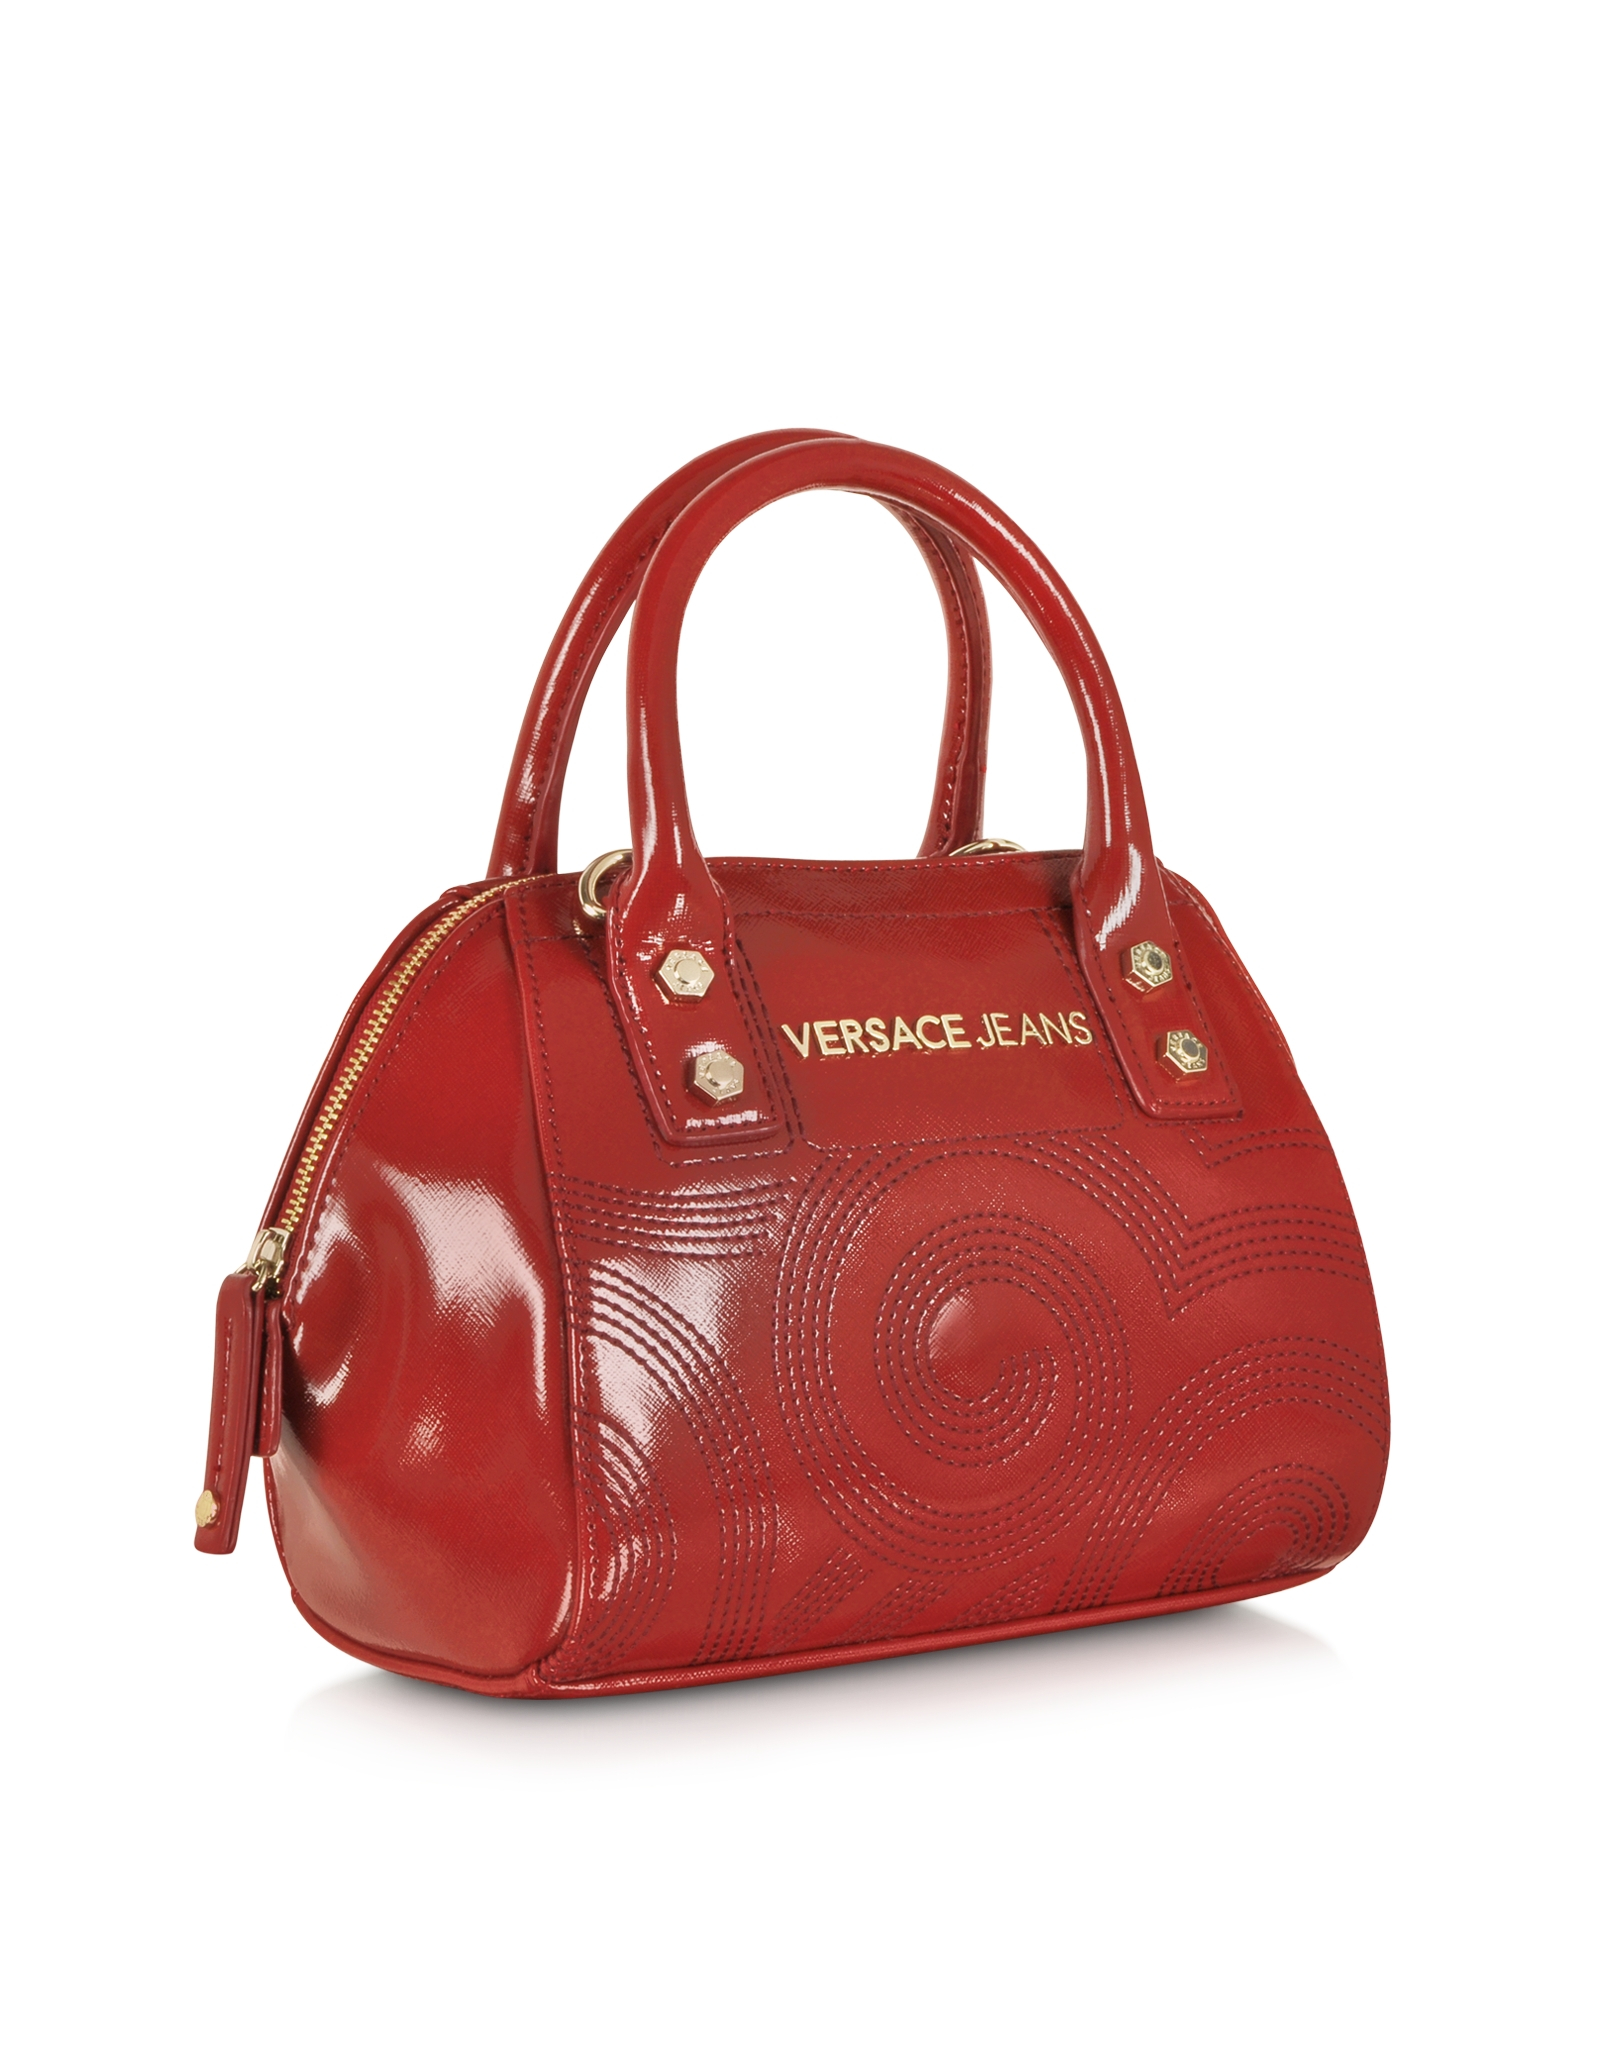 Versace Jeans Dark Red Patent Eco Leather Embroidered Mini Satchel ... 7db9e1052e